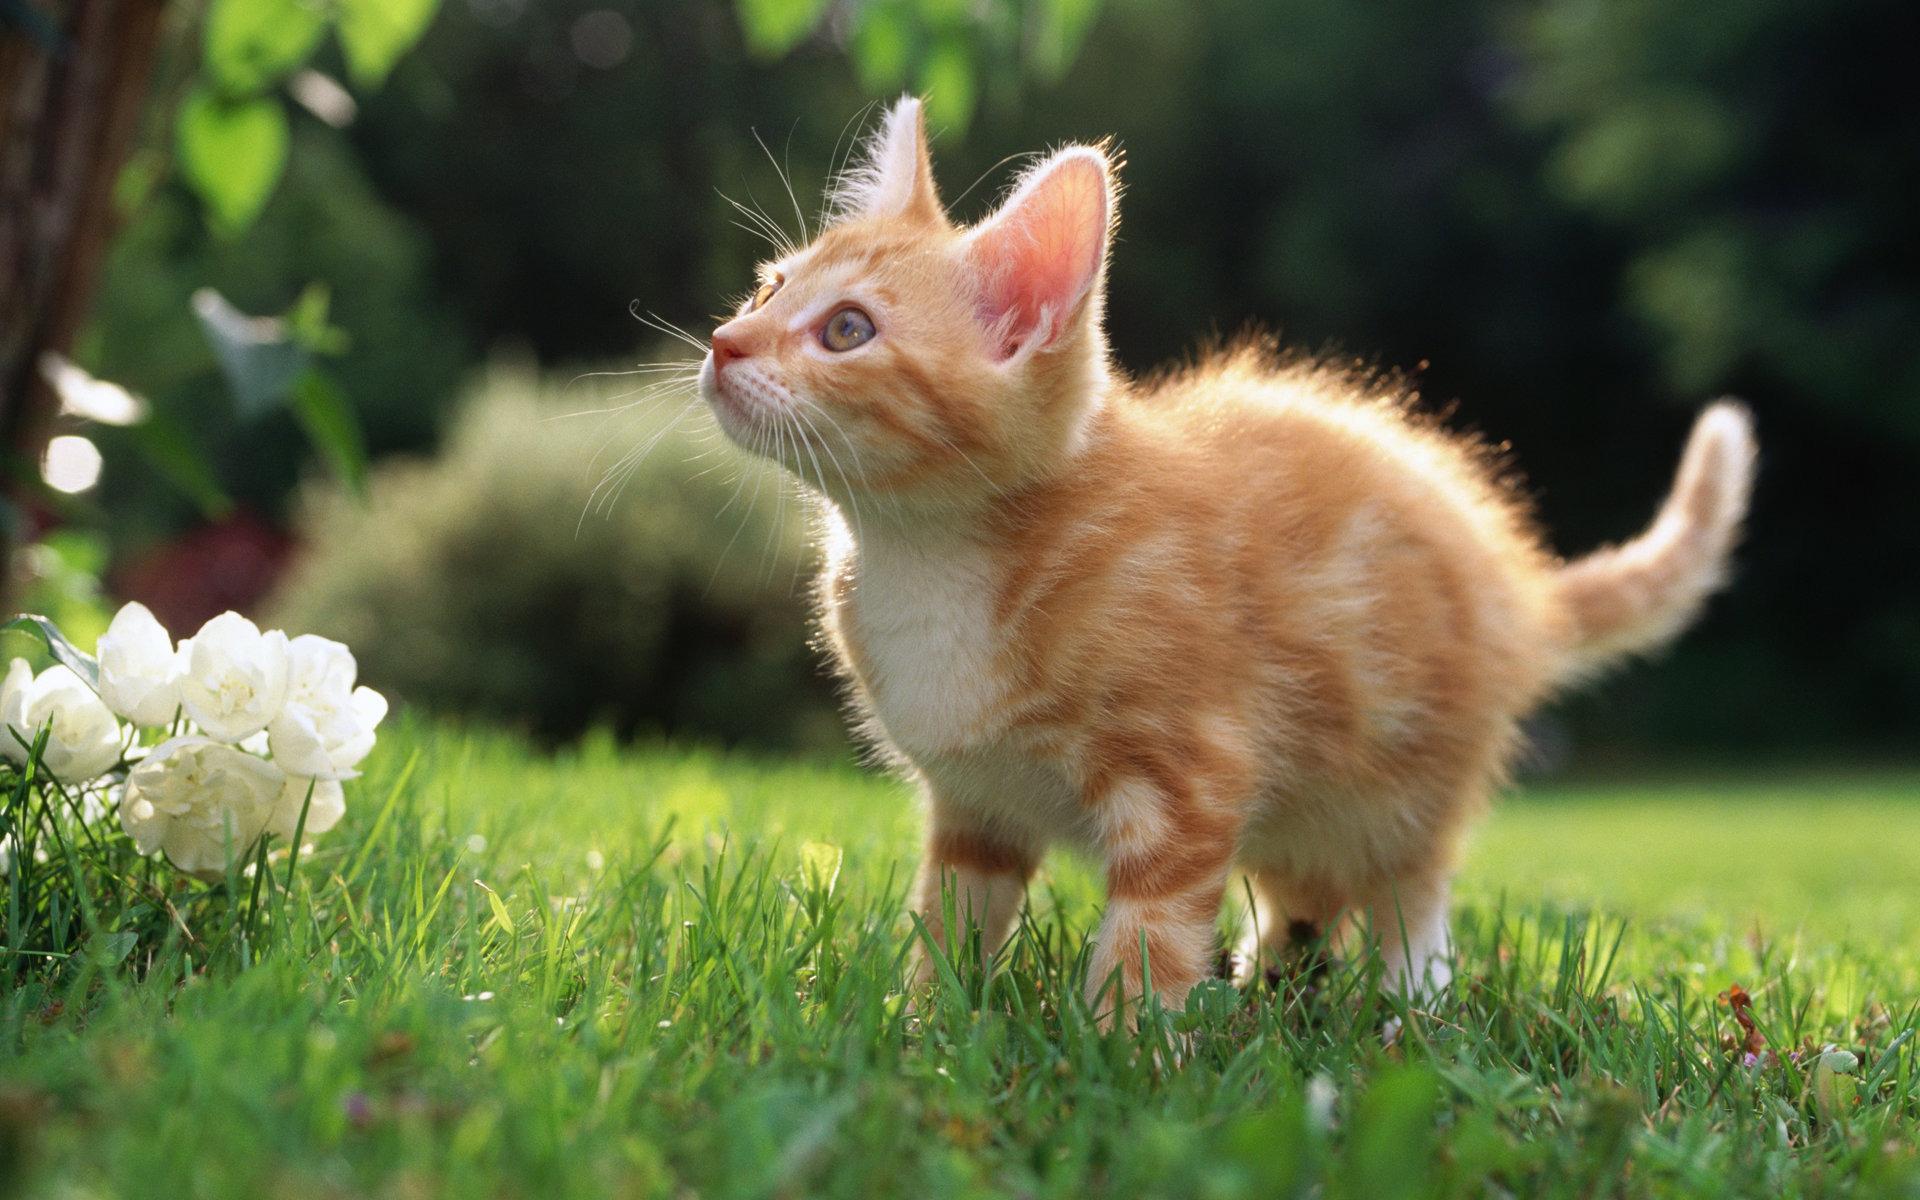 Котенок на травке  № 2954294 бесплатно